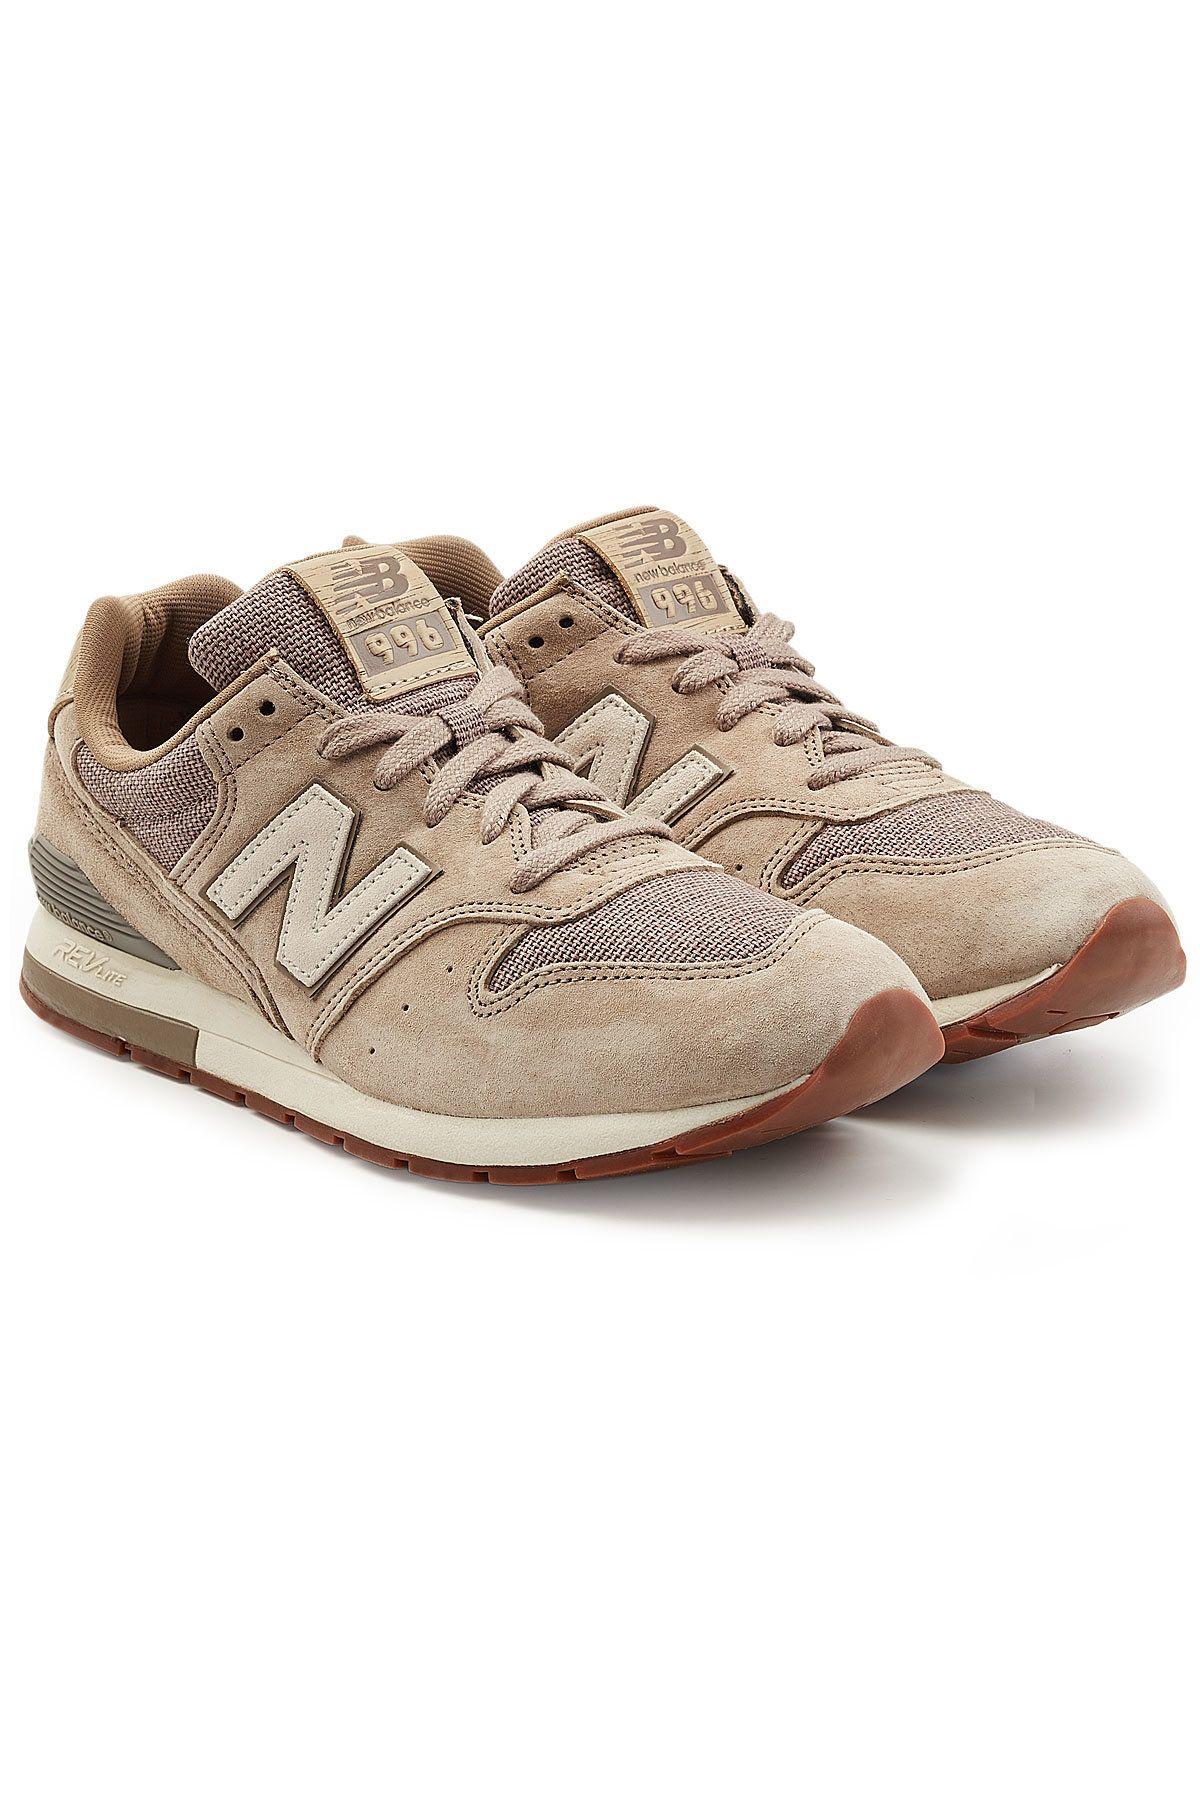 996 new balance hombre beige